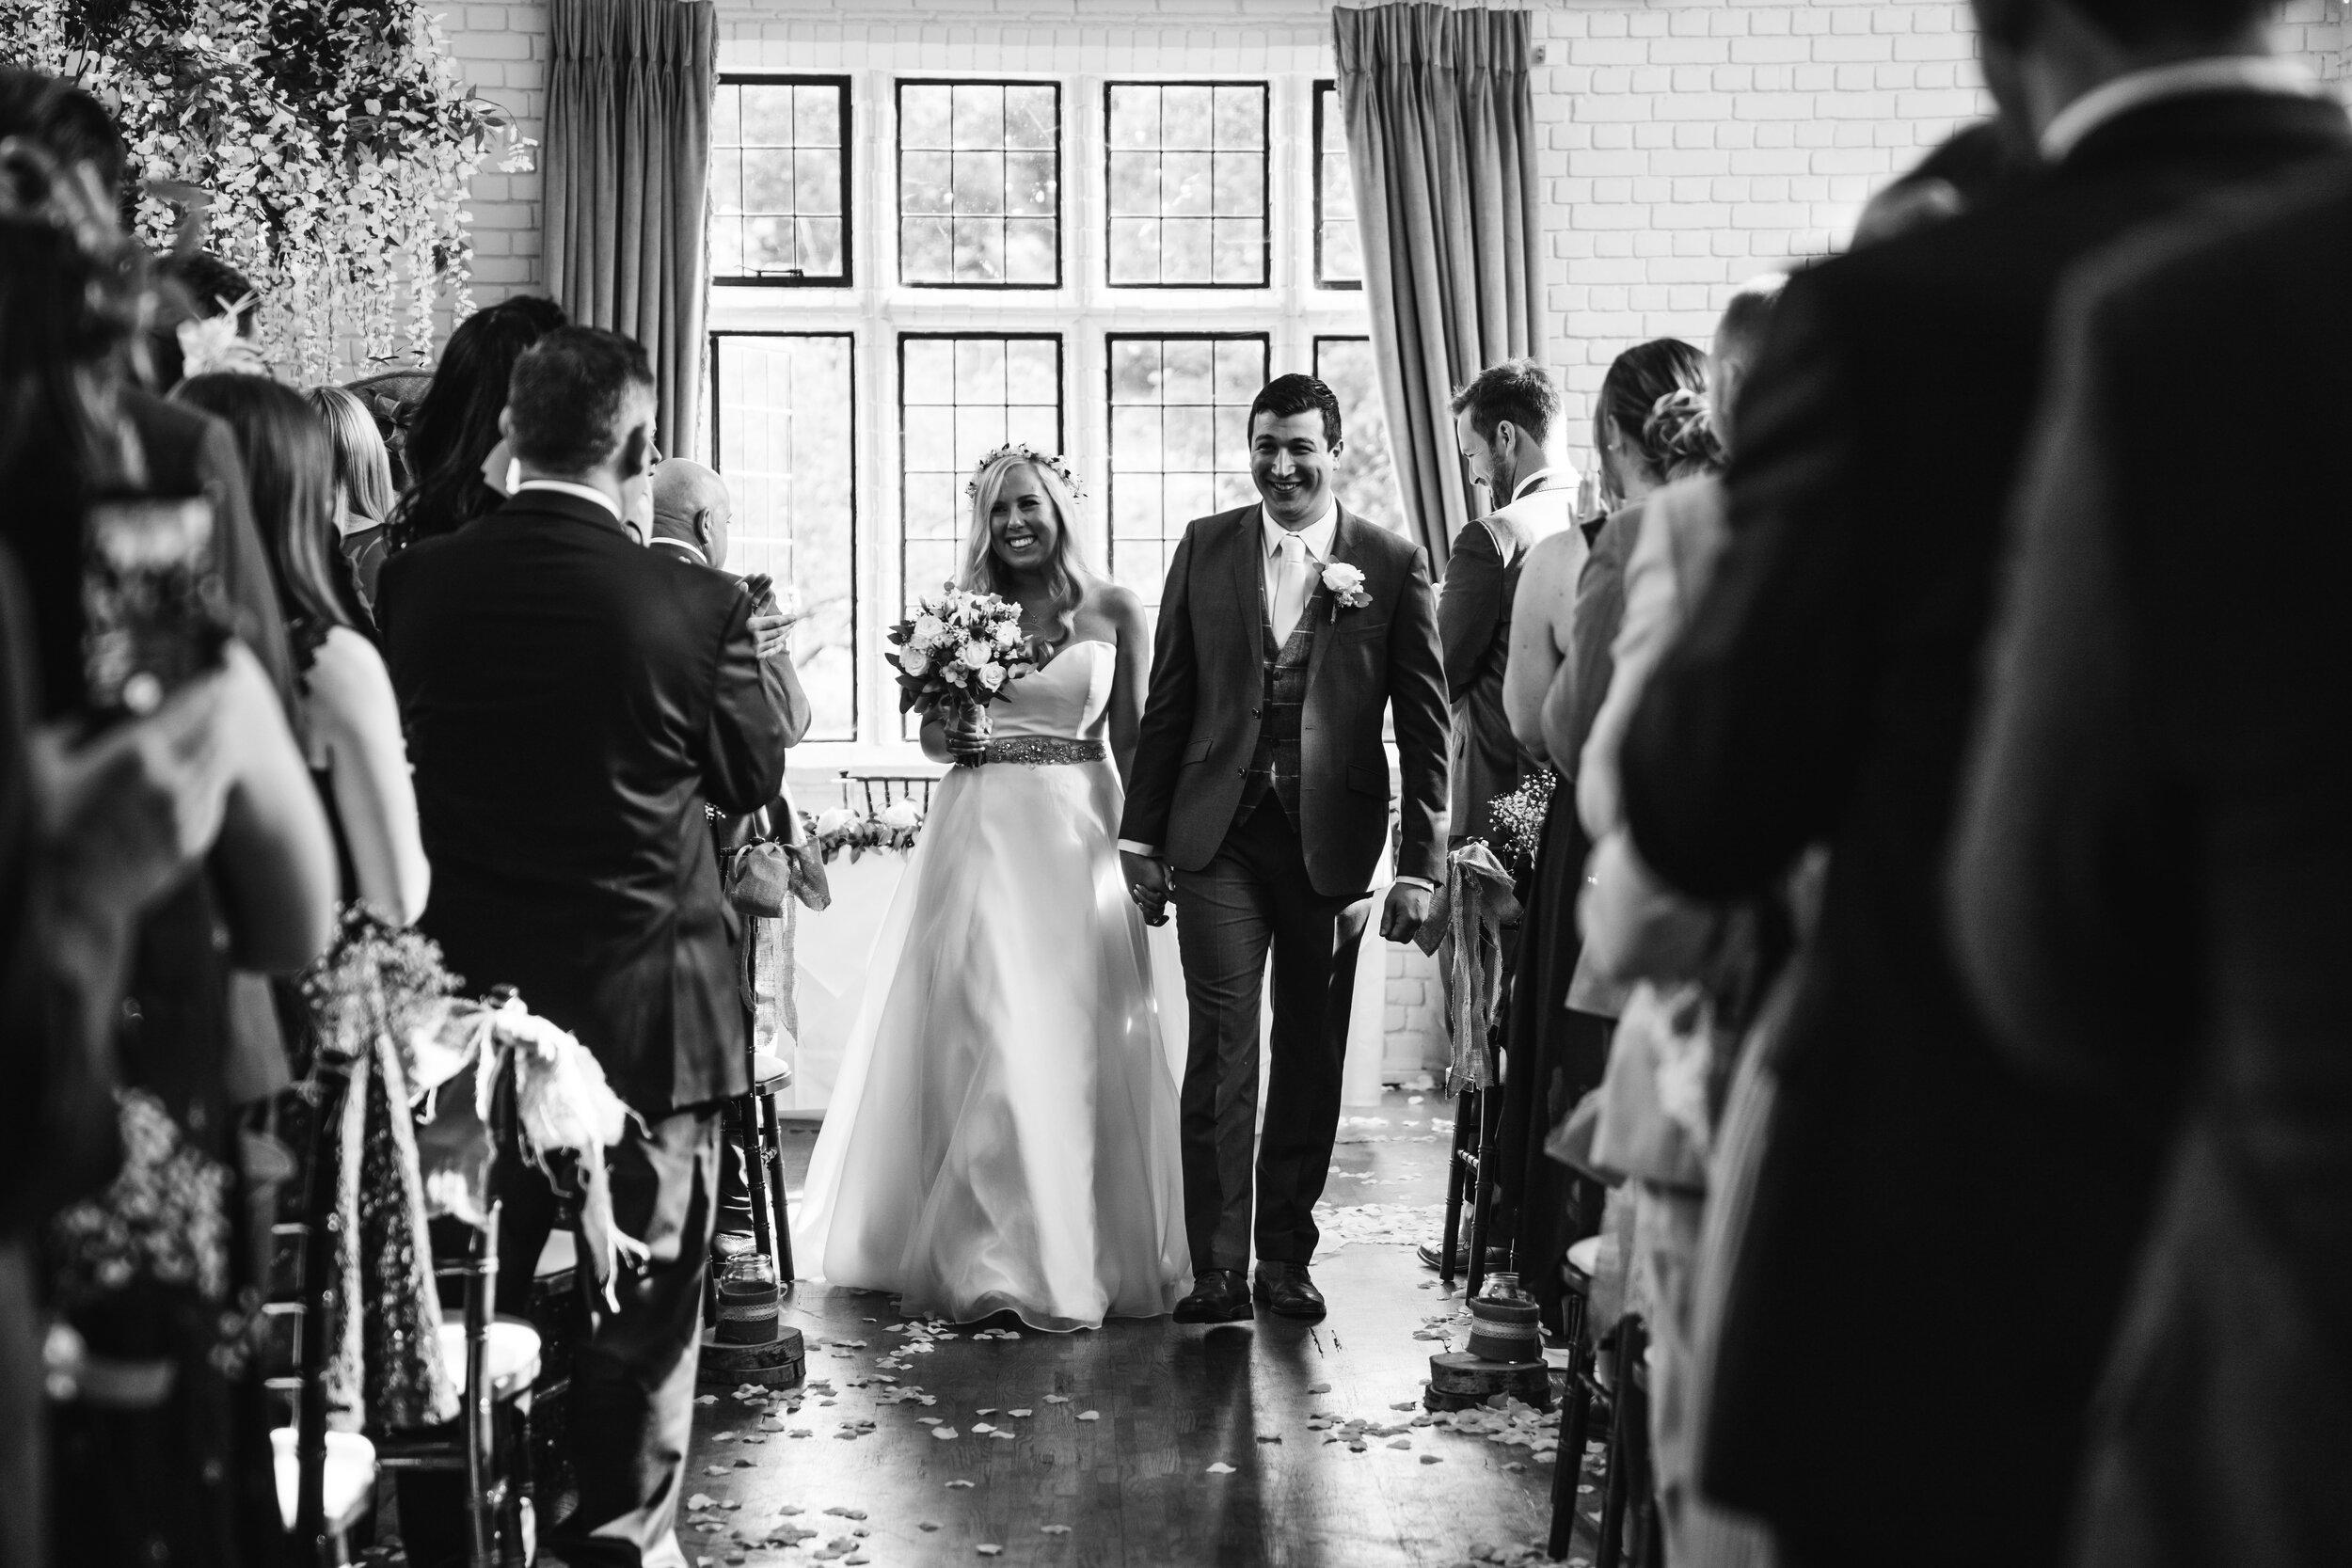 kent-wedding-photographer-203776.jpg